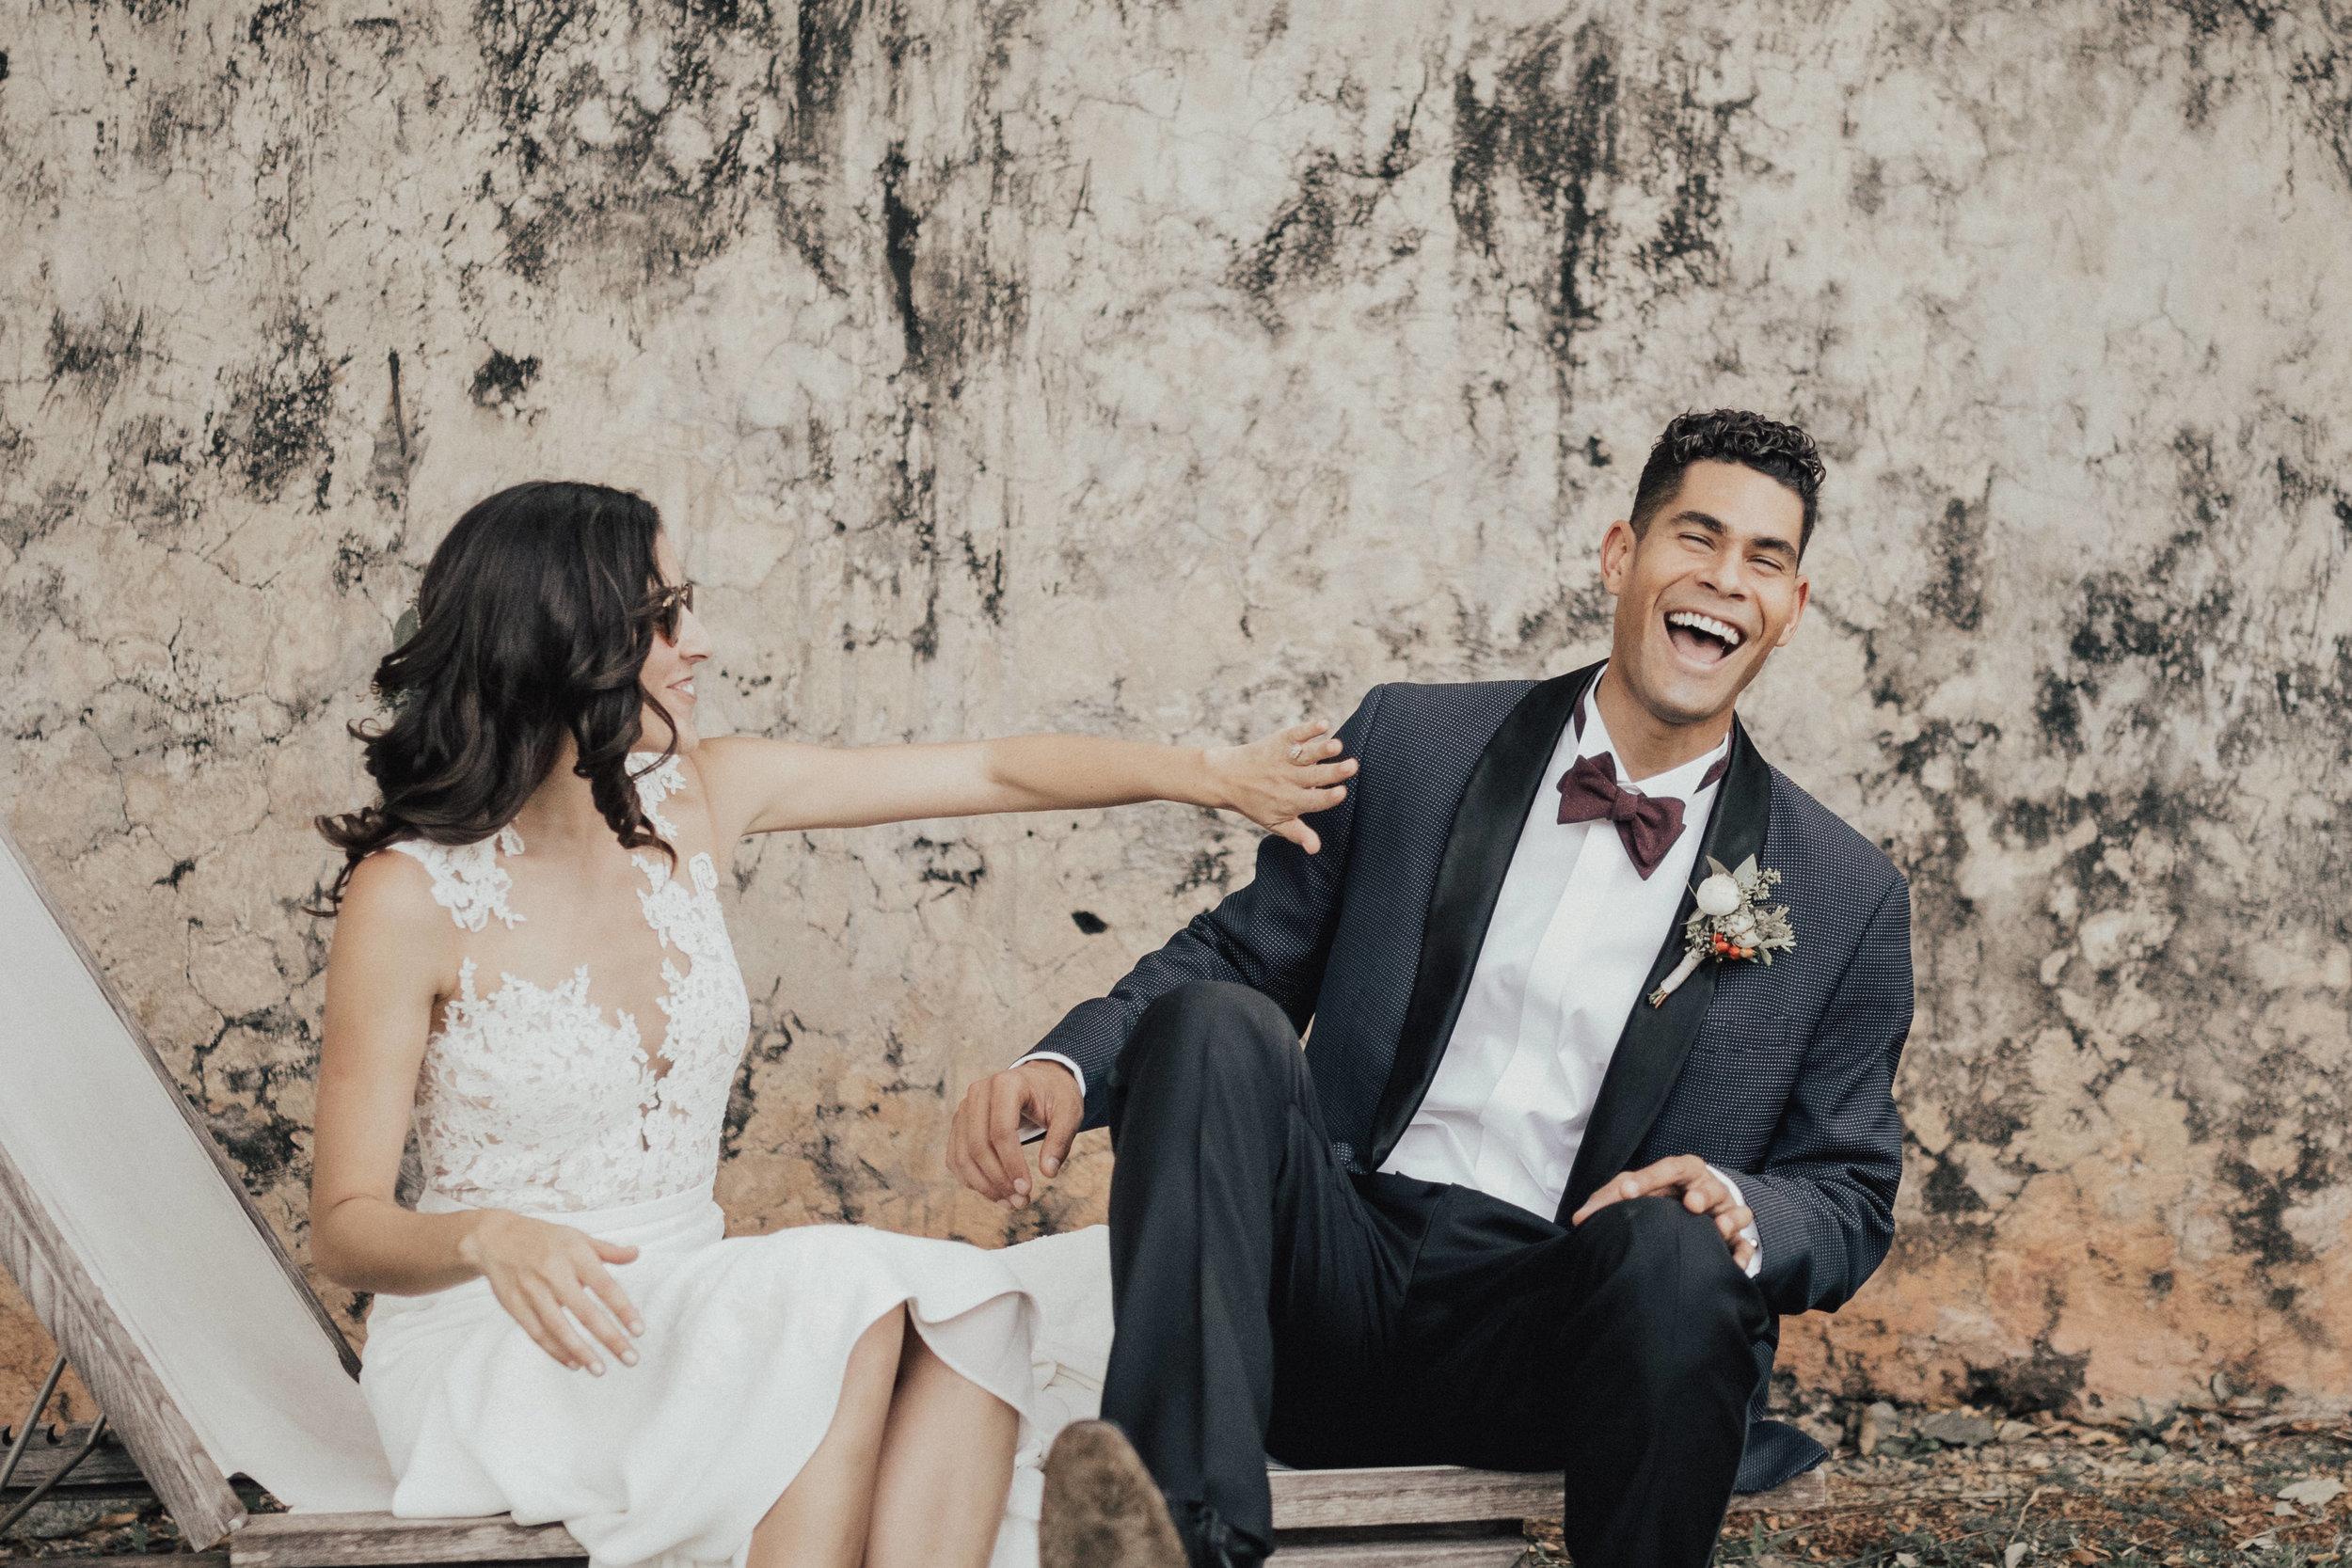 2 first look Tina Kai Merida Mexico Wedding  (84 of 120).jpg